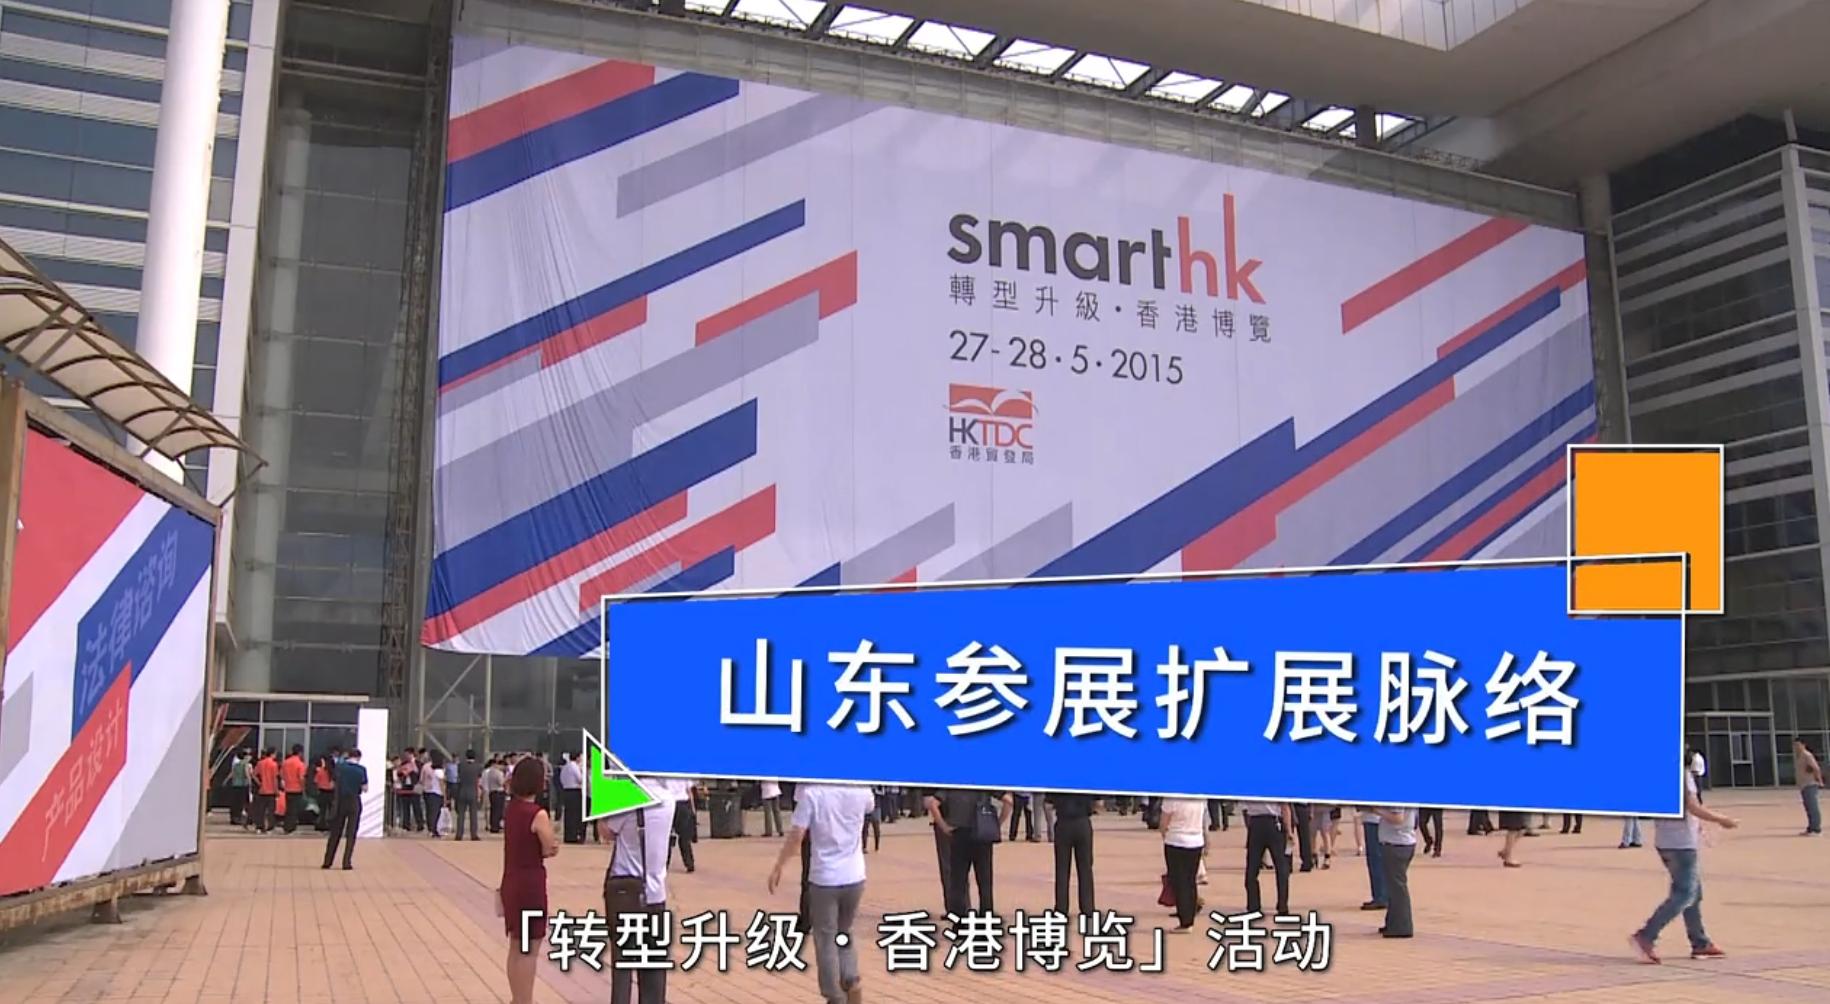 Presentation in Smarthk, Jinan